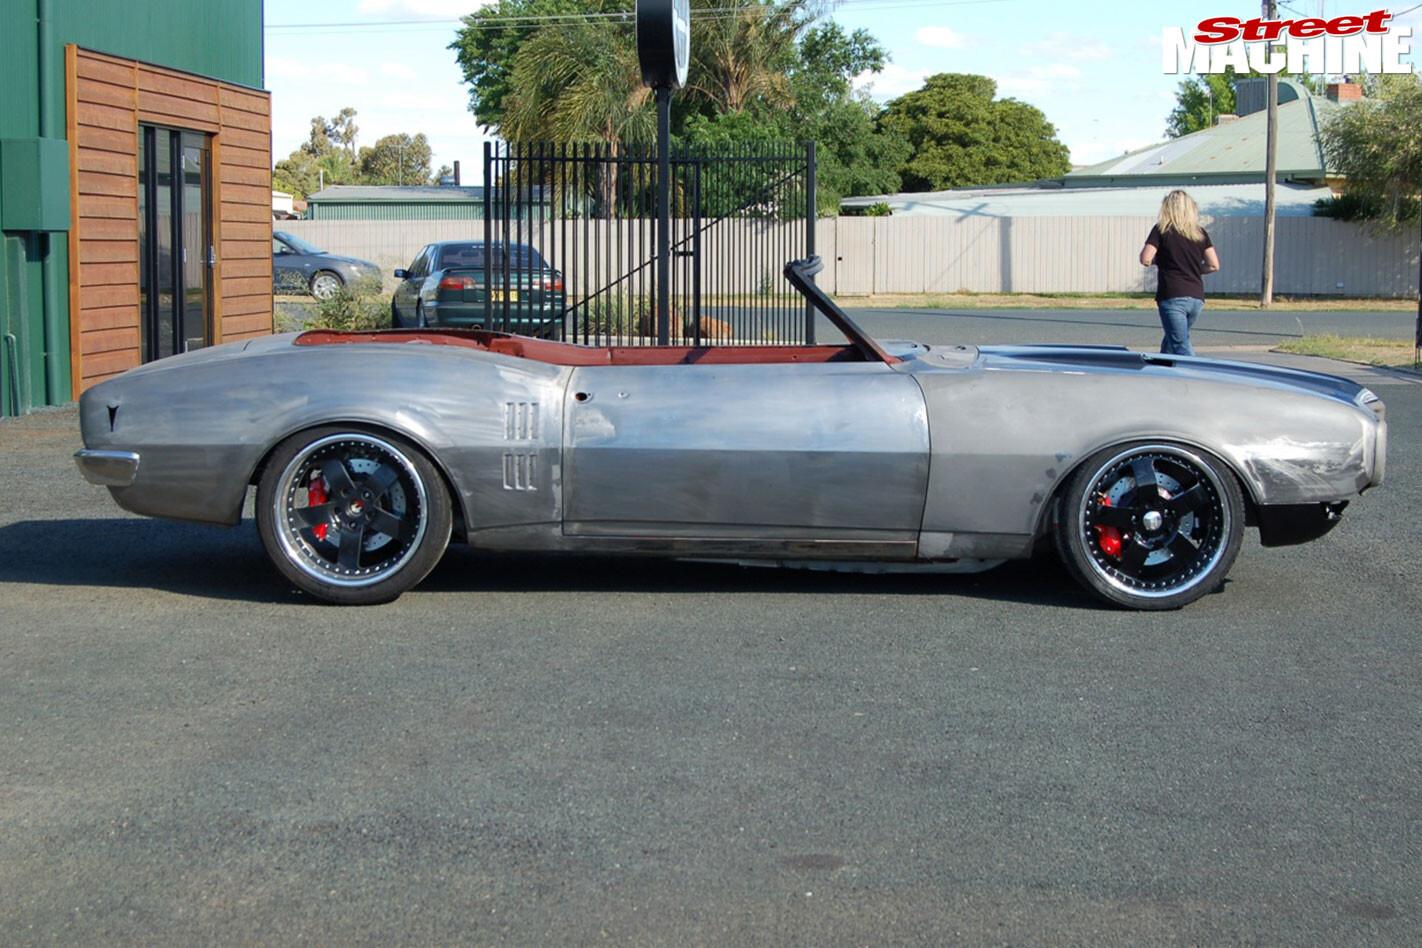 Pontiac Firebird convertible body